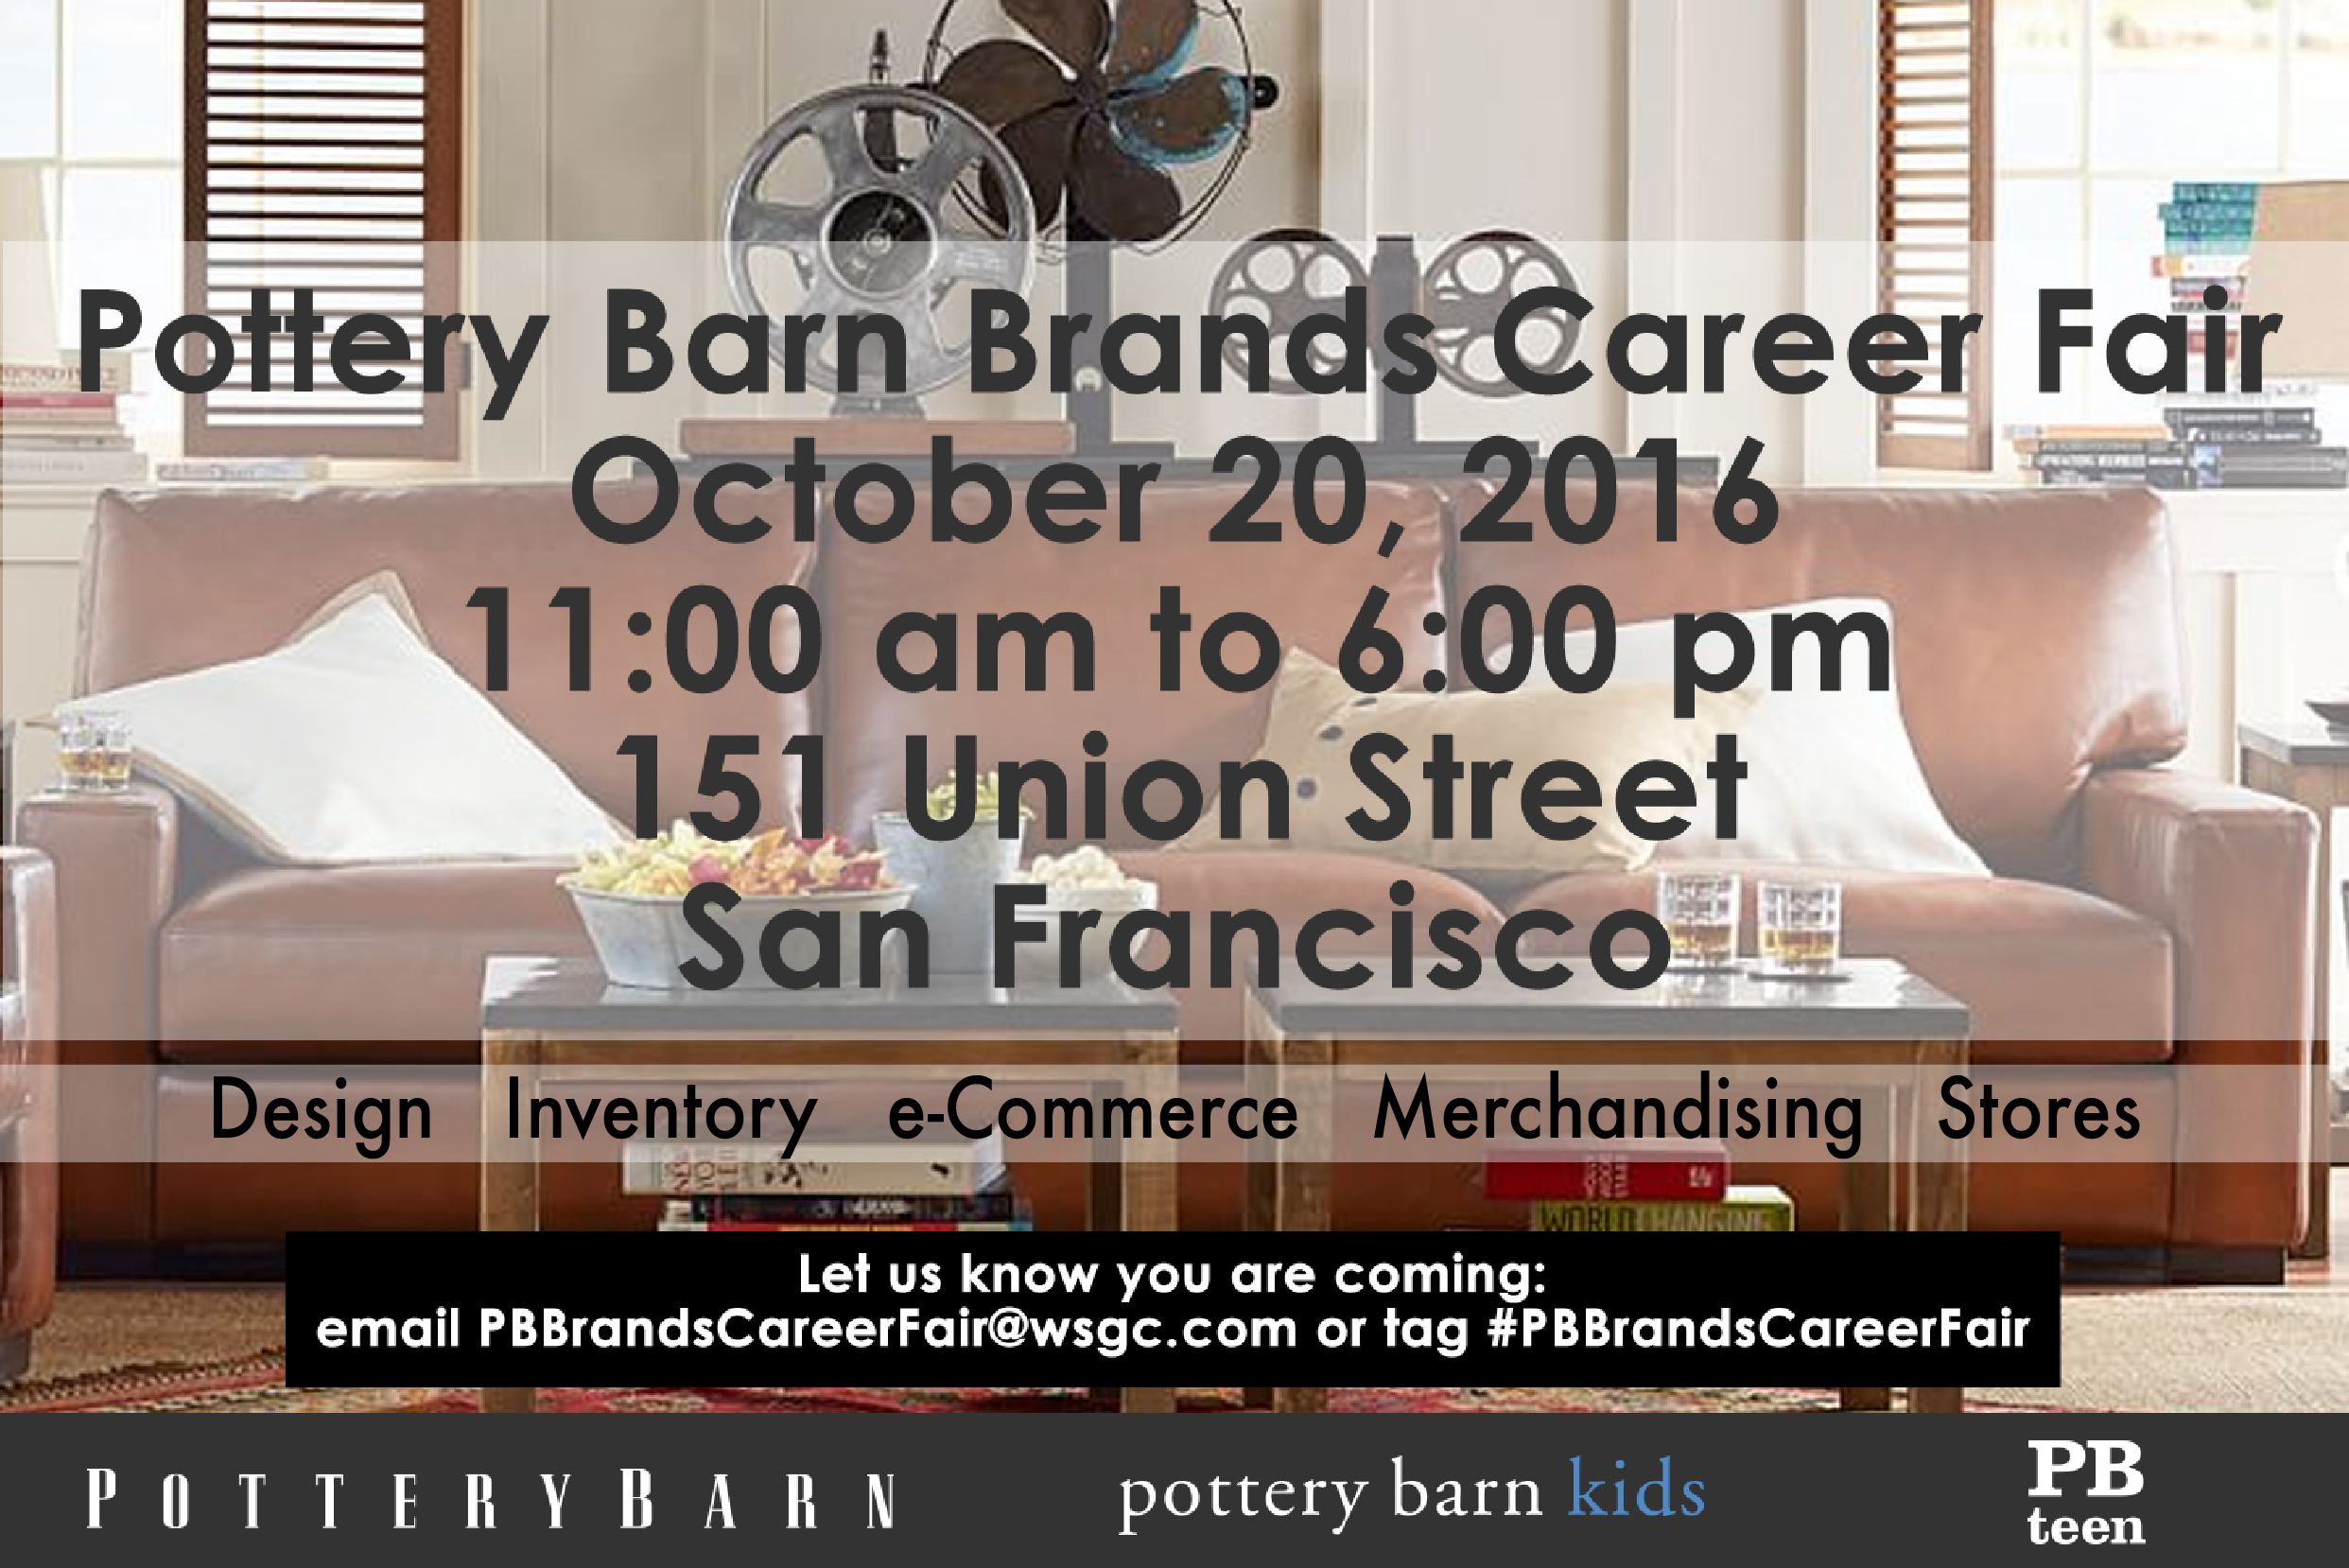 Pottery Barn Job Fair With Images San Francisco Design